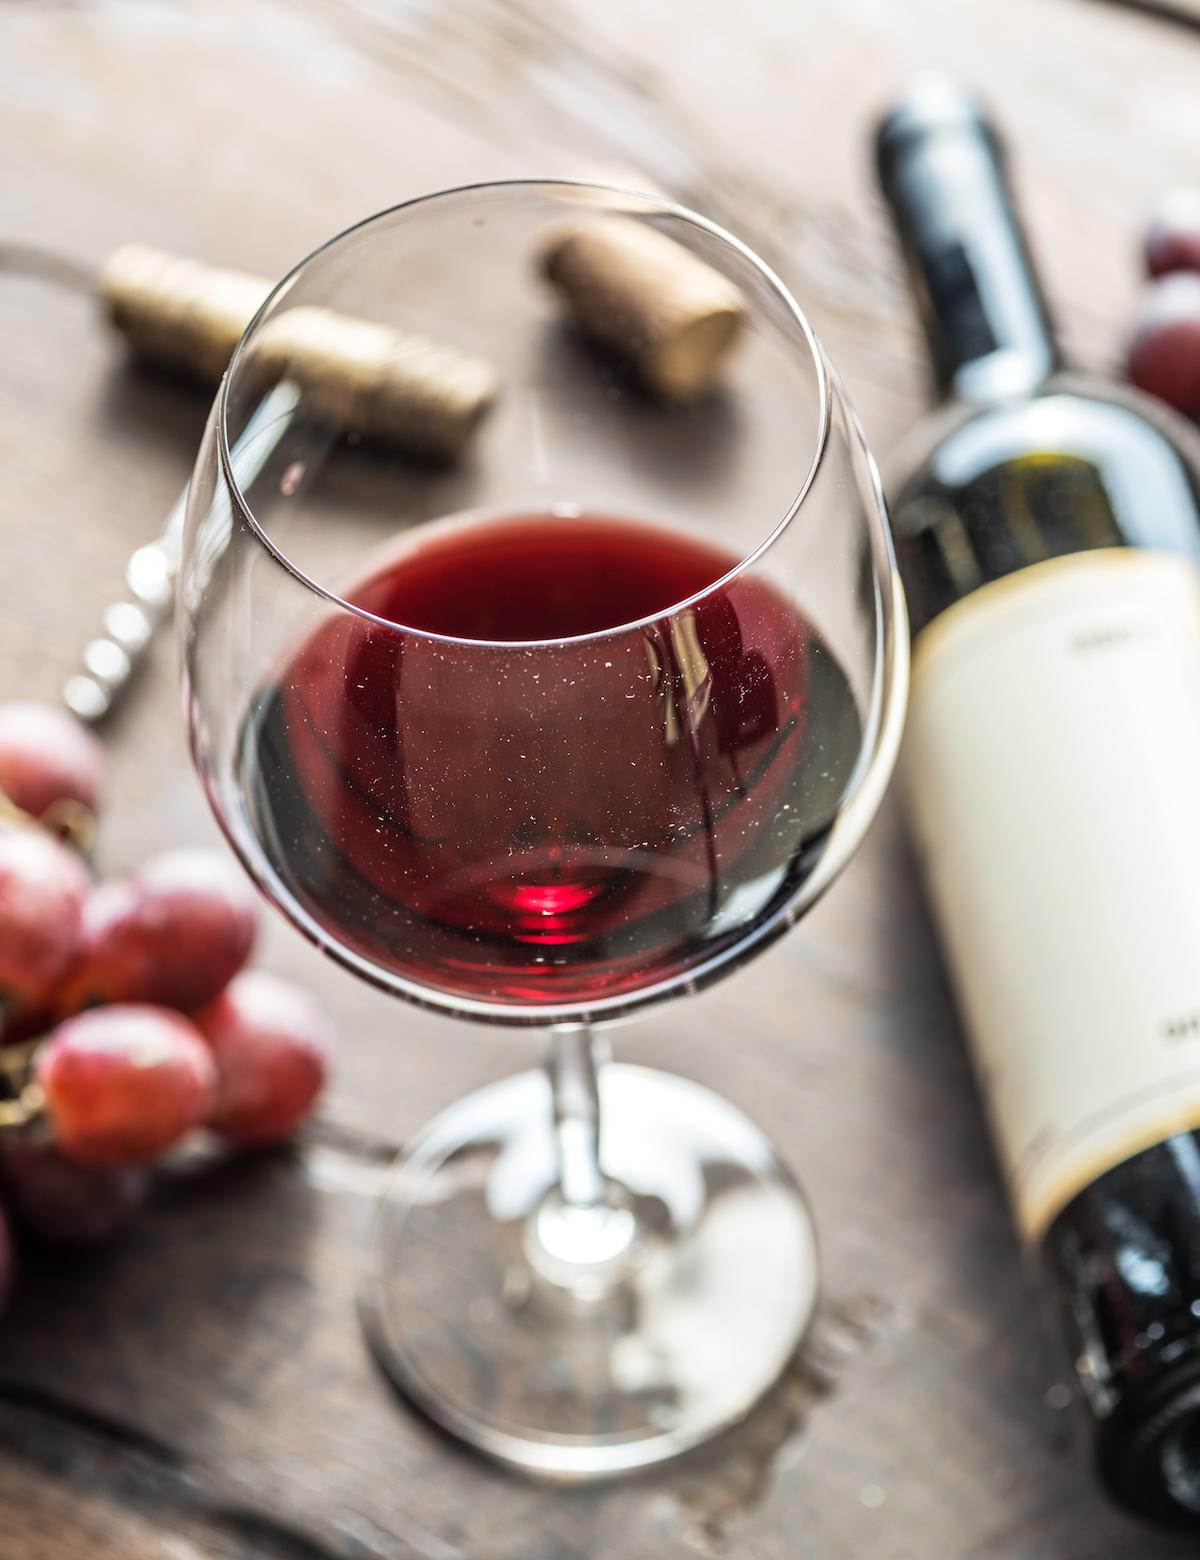 Vins - Shutterstock